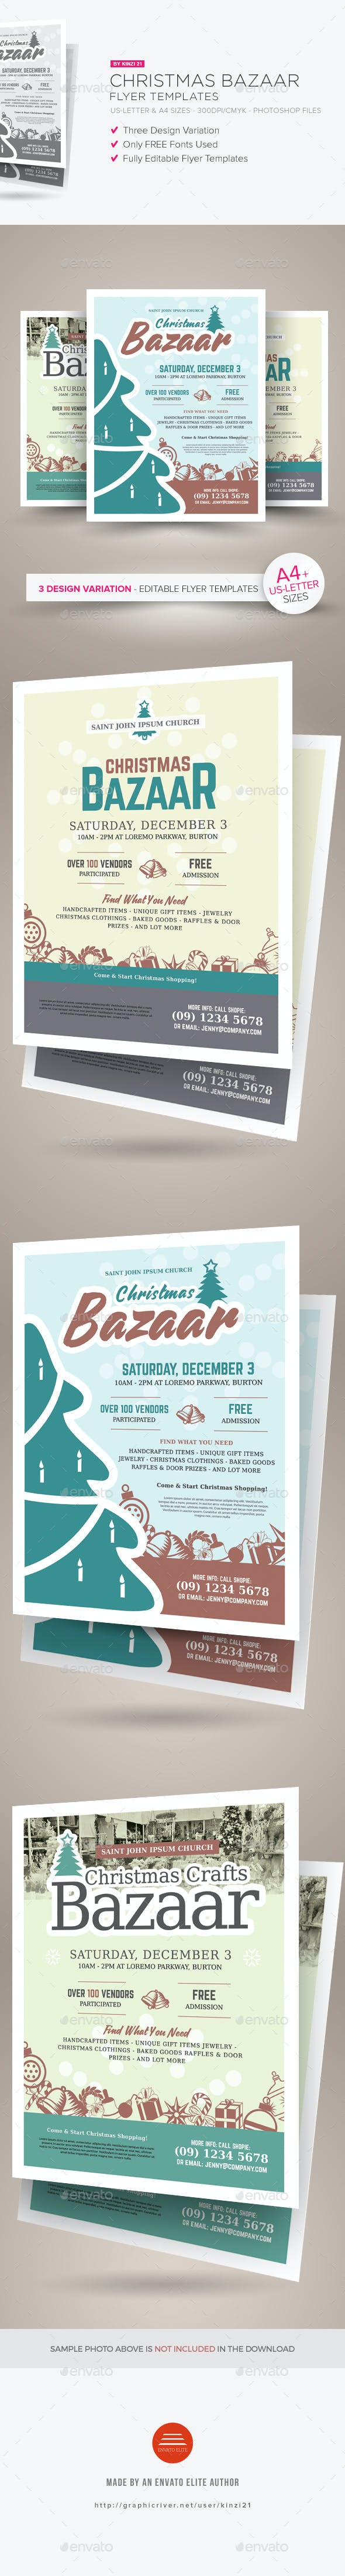 christmas bazaar flyer templates by kinzi21 graphicriver